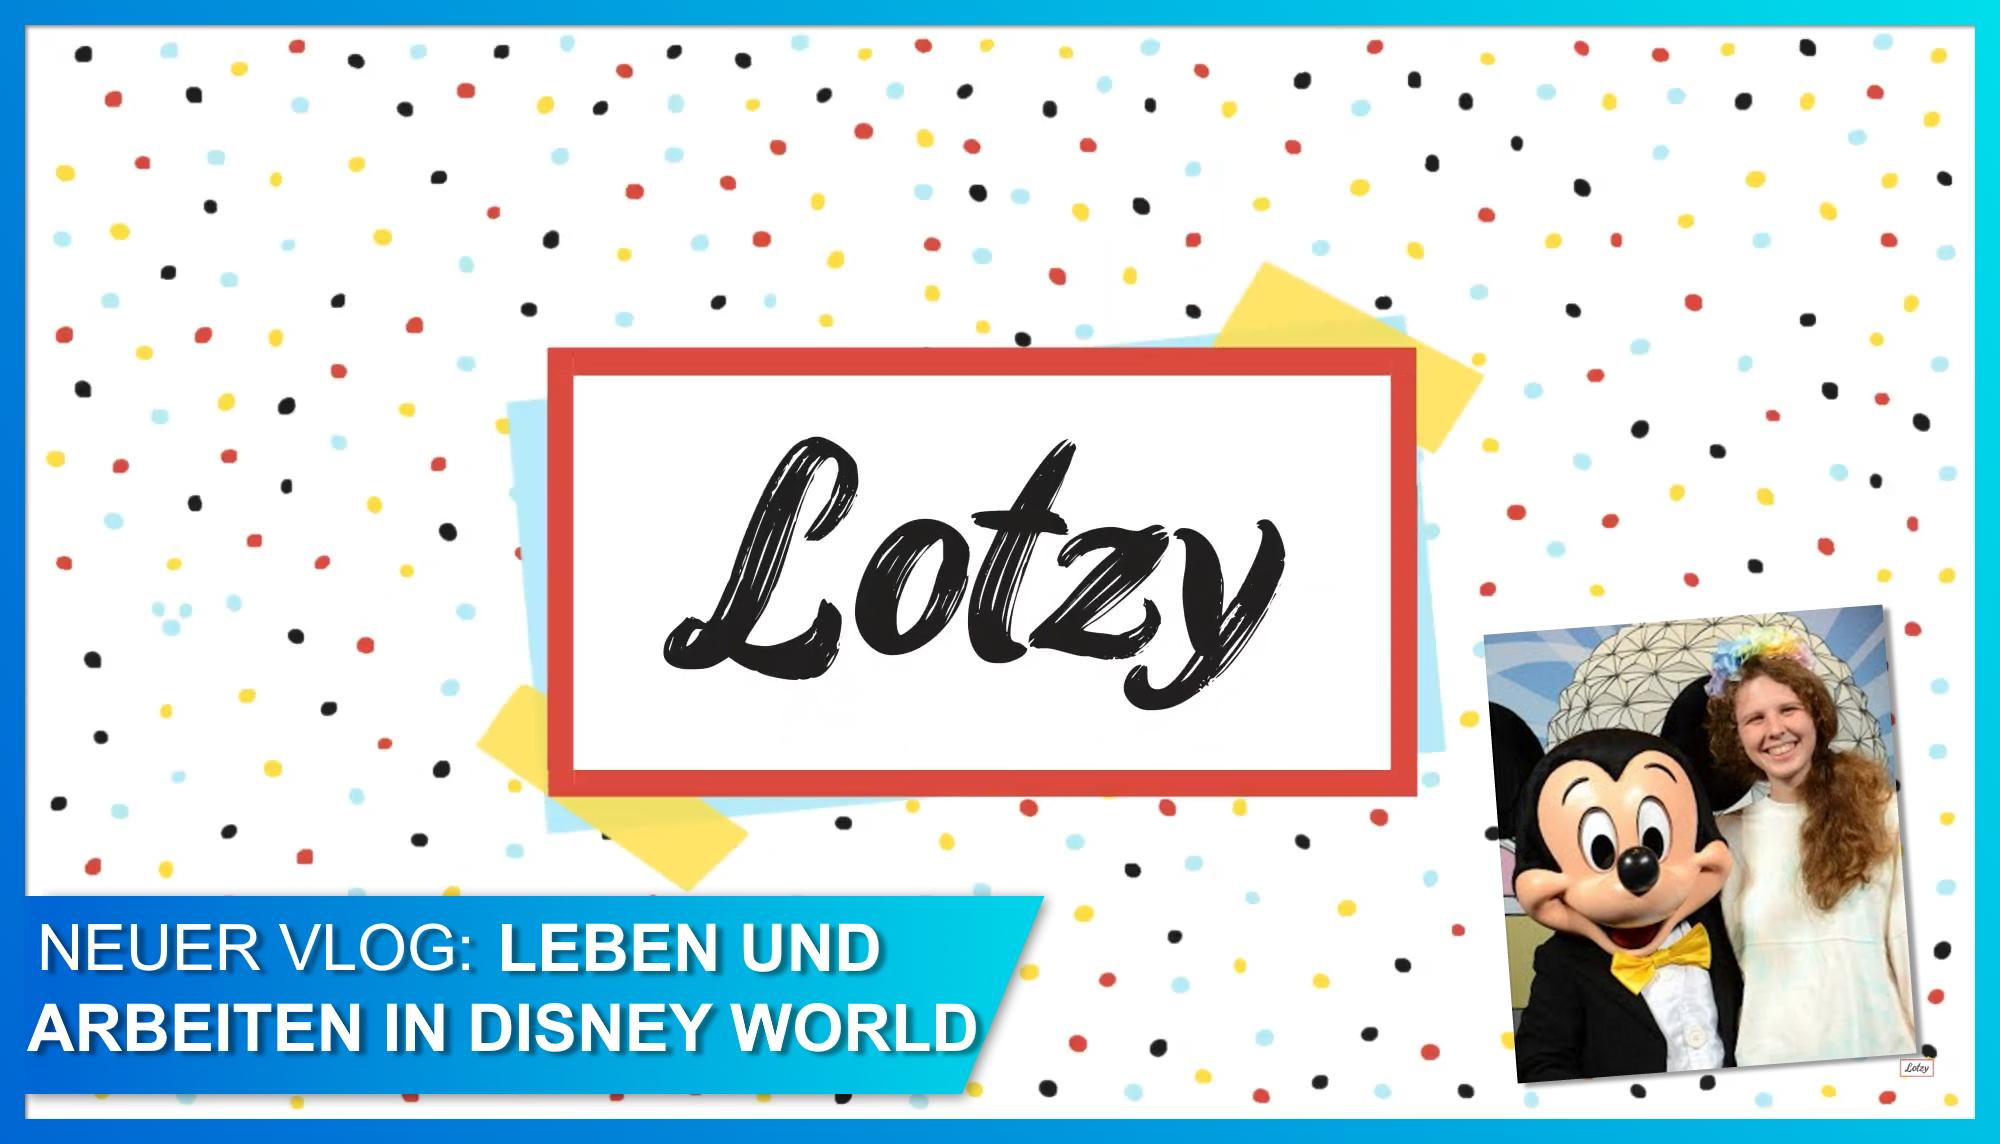 Lotzy's CRP Vlog